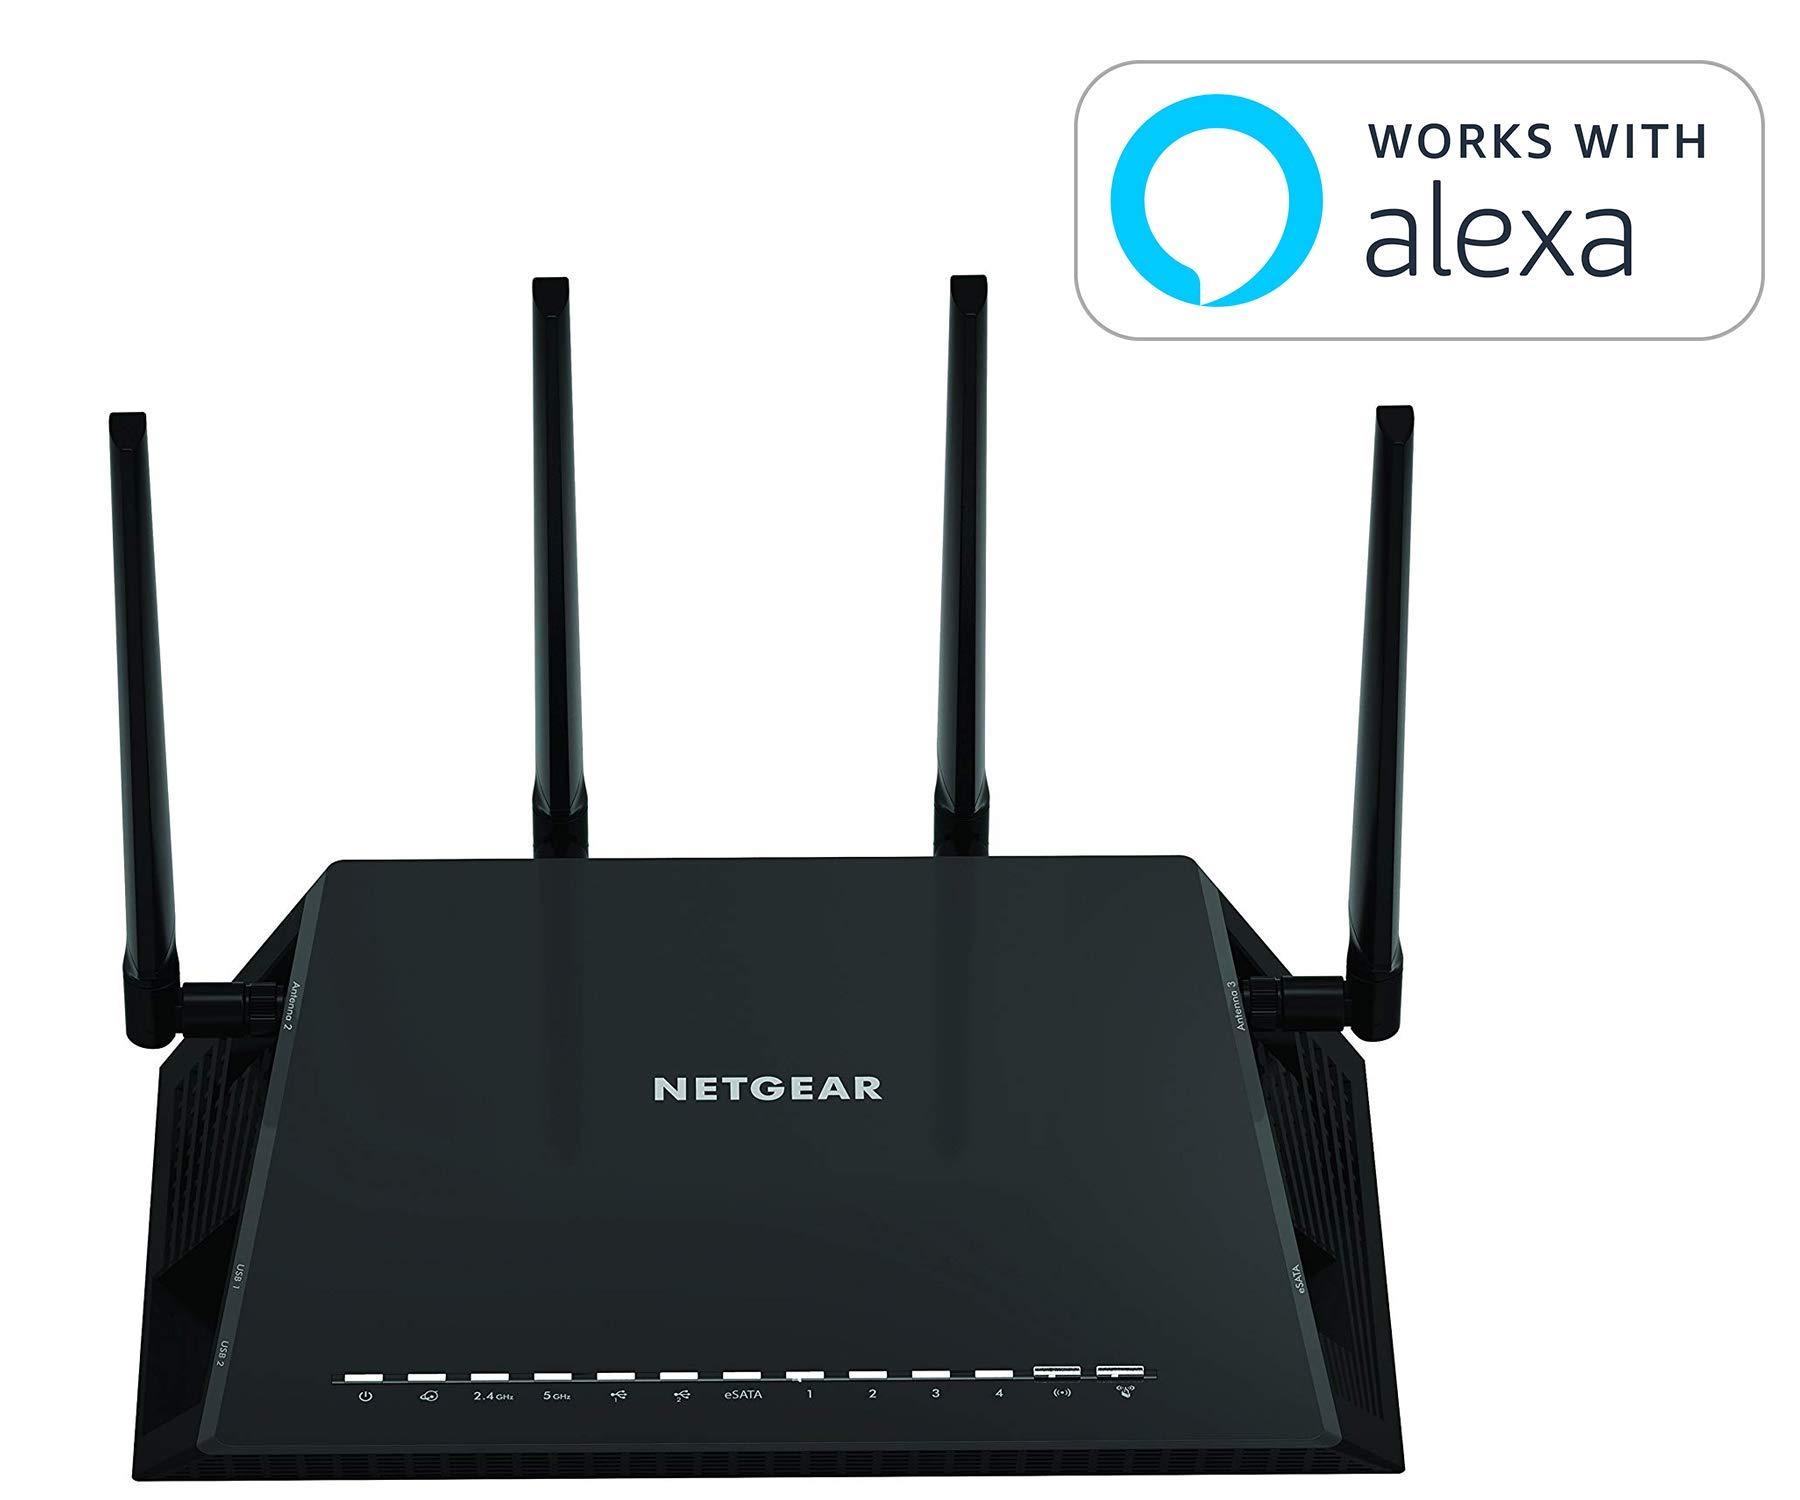 NETGEAR Nighthawk X6 AC3000 Dual Band Smart WiFi Router, Gigabit Ethernet, Compatible with Amazon Echo/Alexa (R7900) by NETGEAR